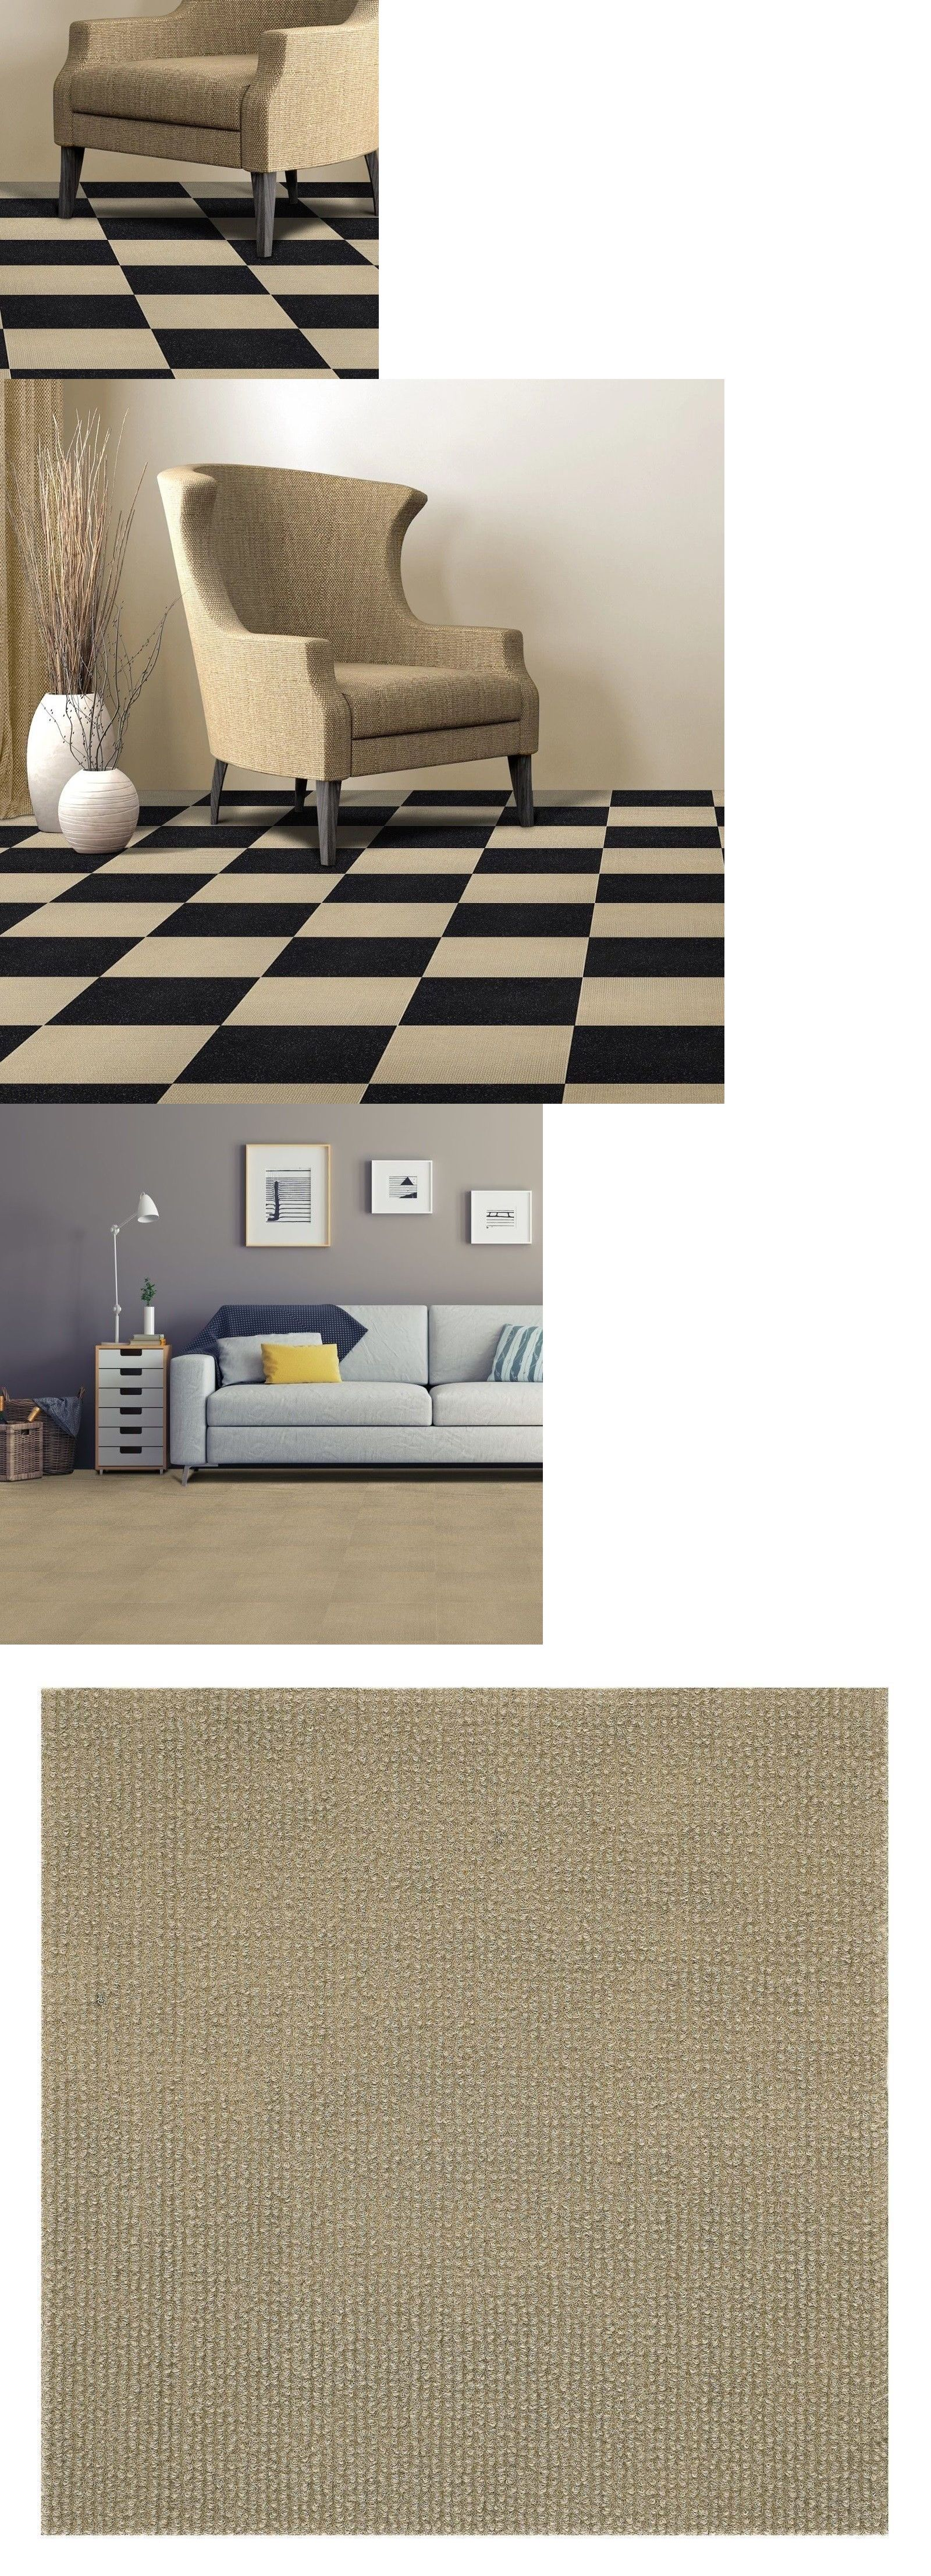 Carpet Tiles 136820 Carpet Tiles Peel And Stick Self Adhesive Mat